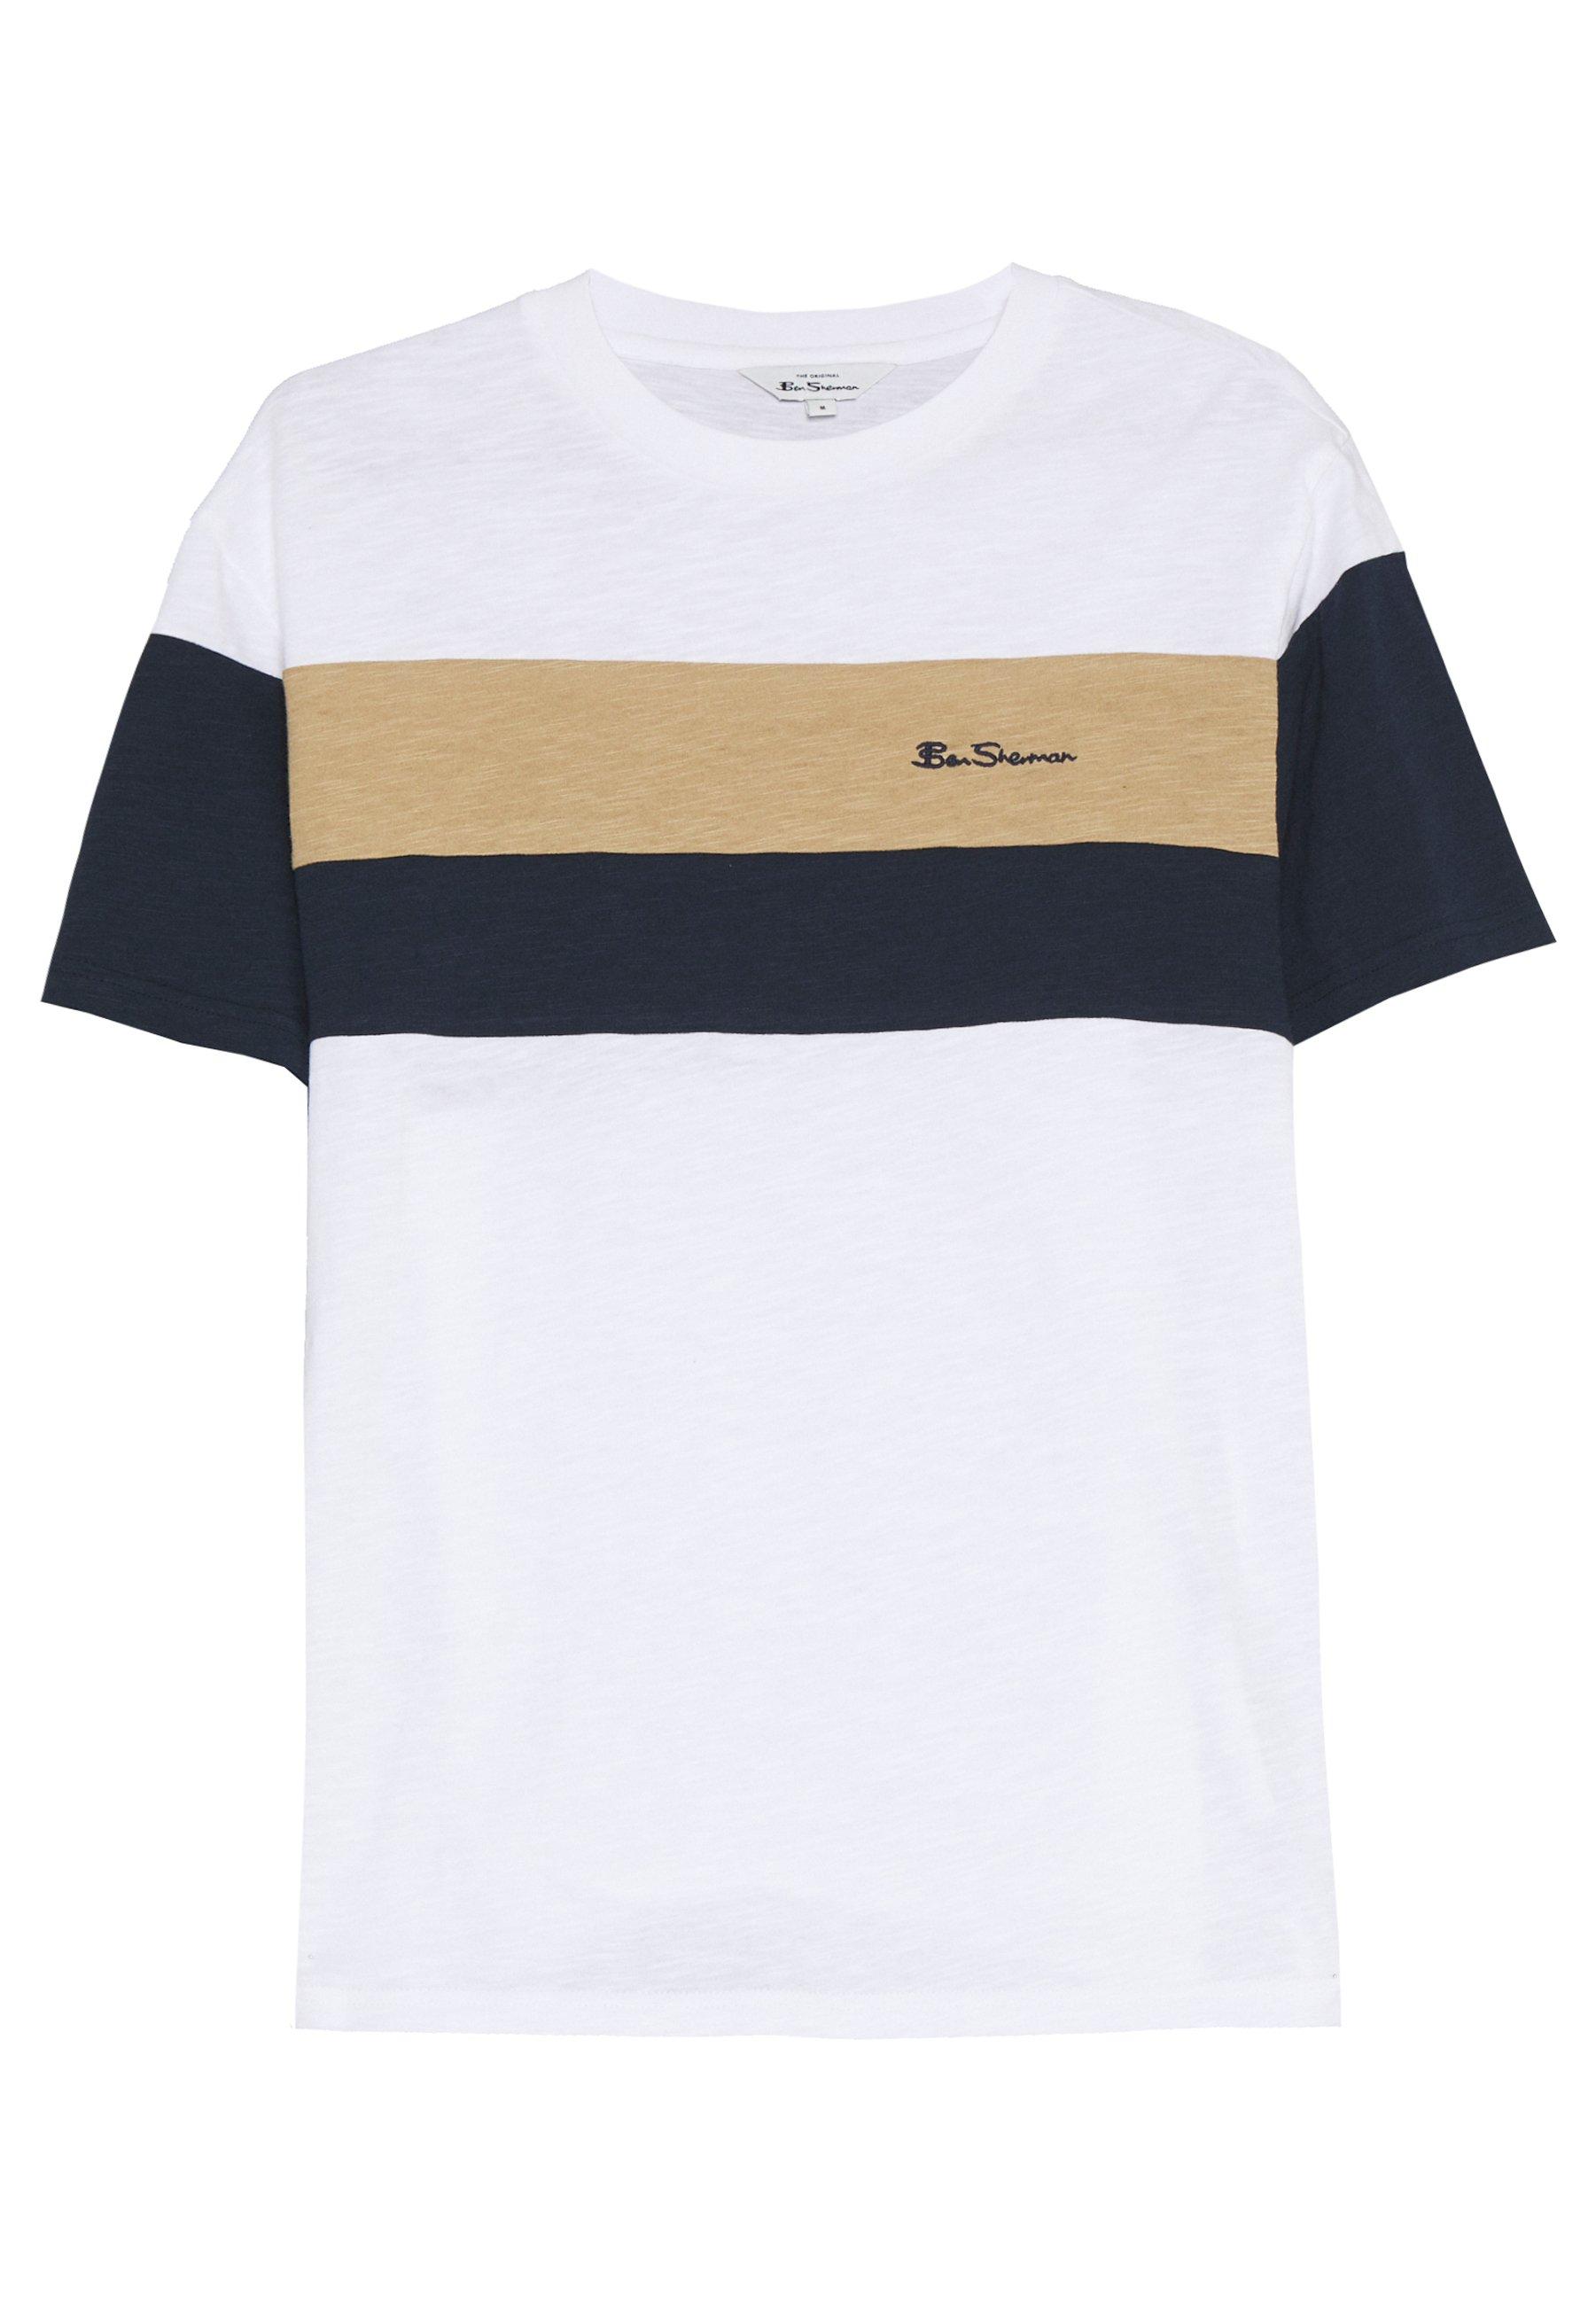 HERITAGE SPORTS BLOCK TEE T shirt imprimé white